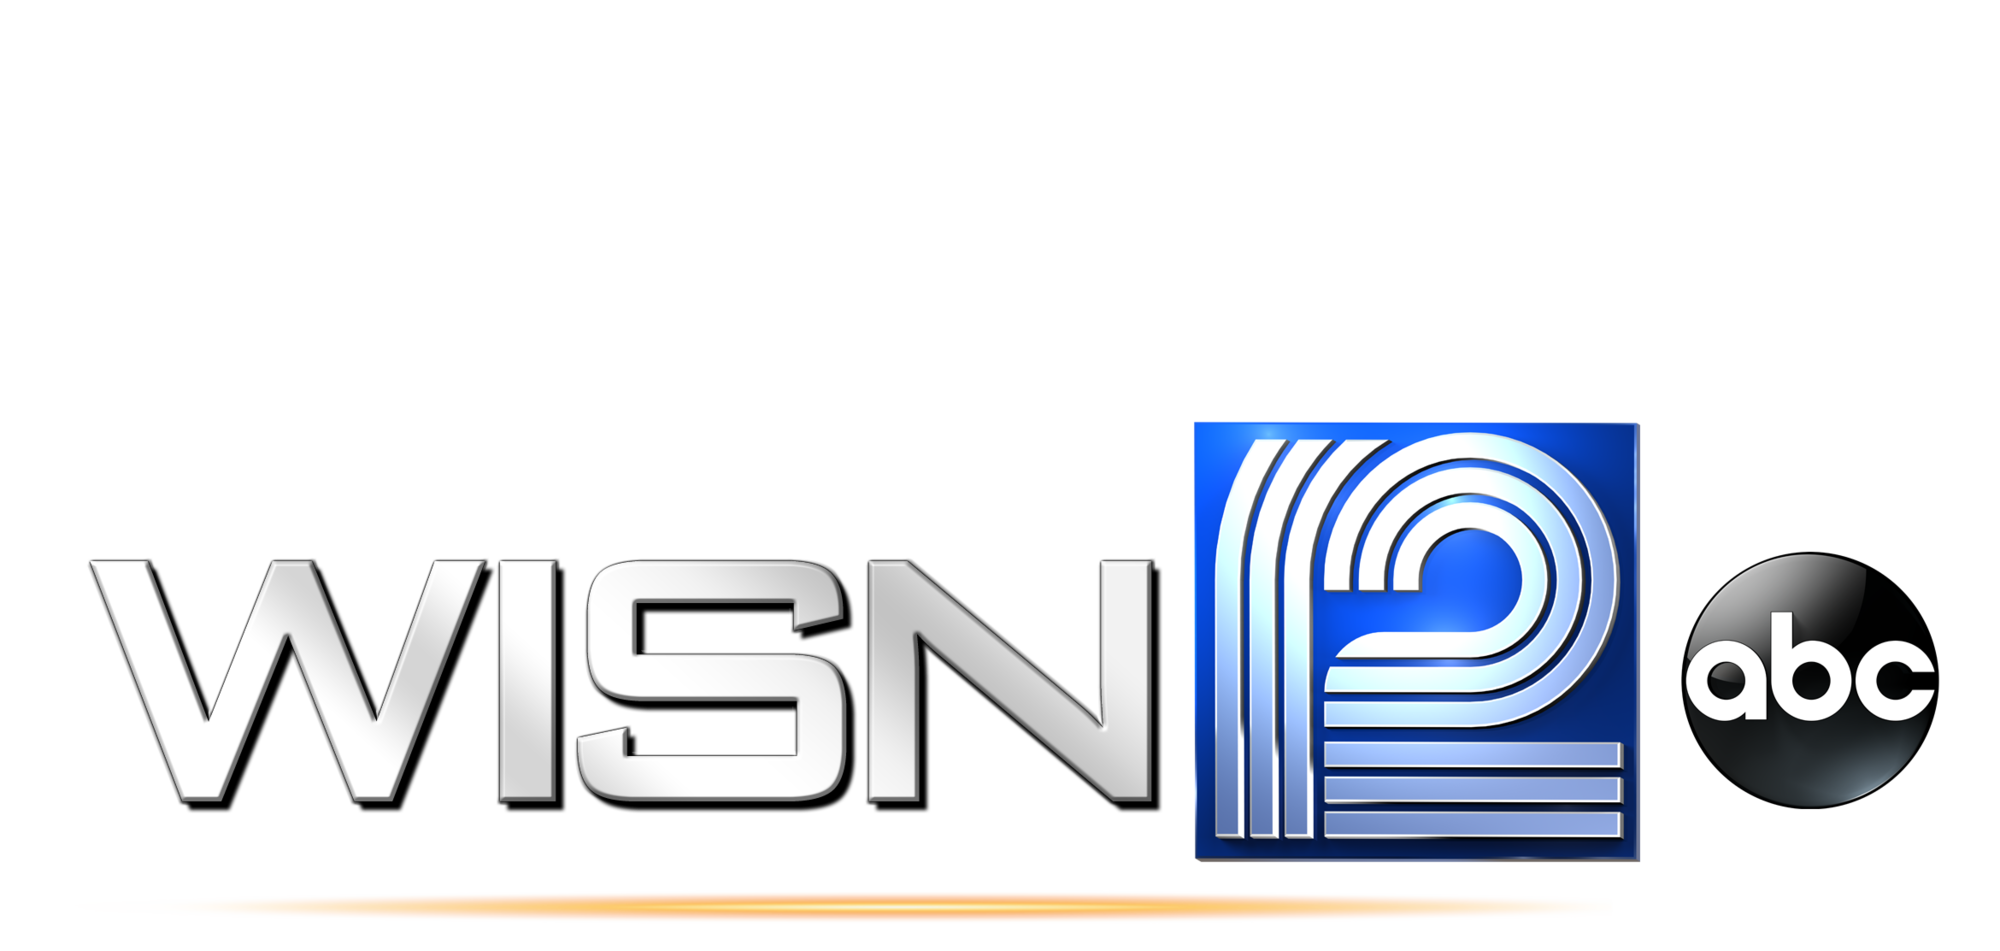 WISN_12 web logo.png